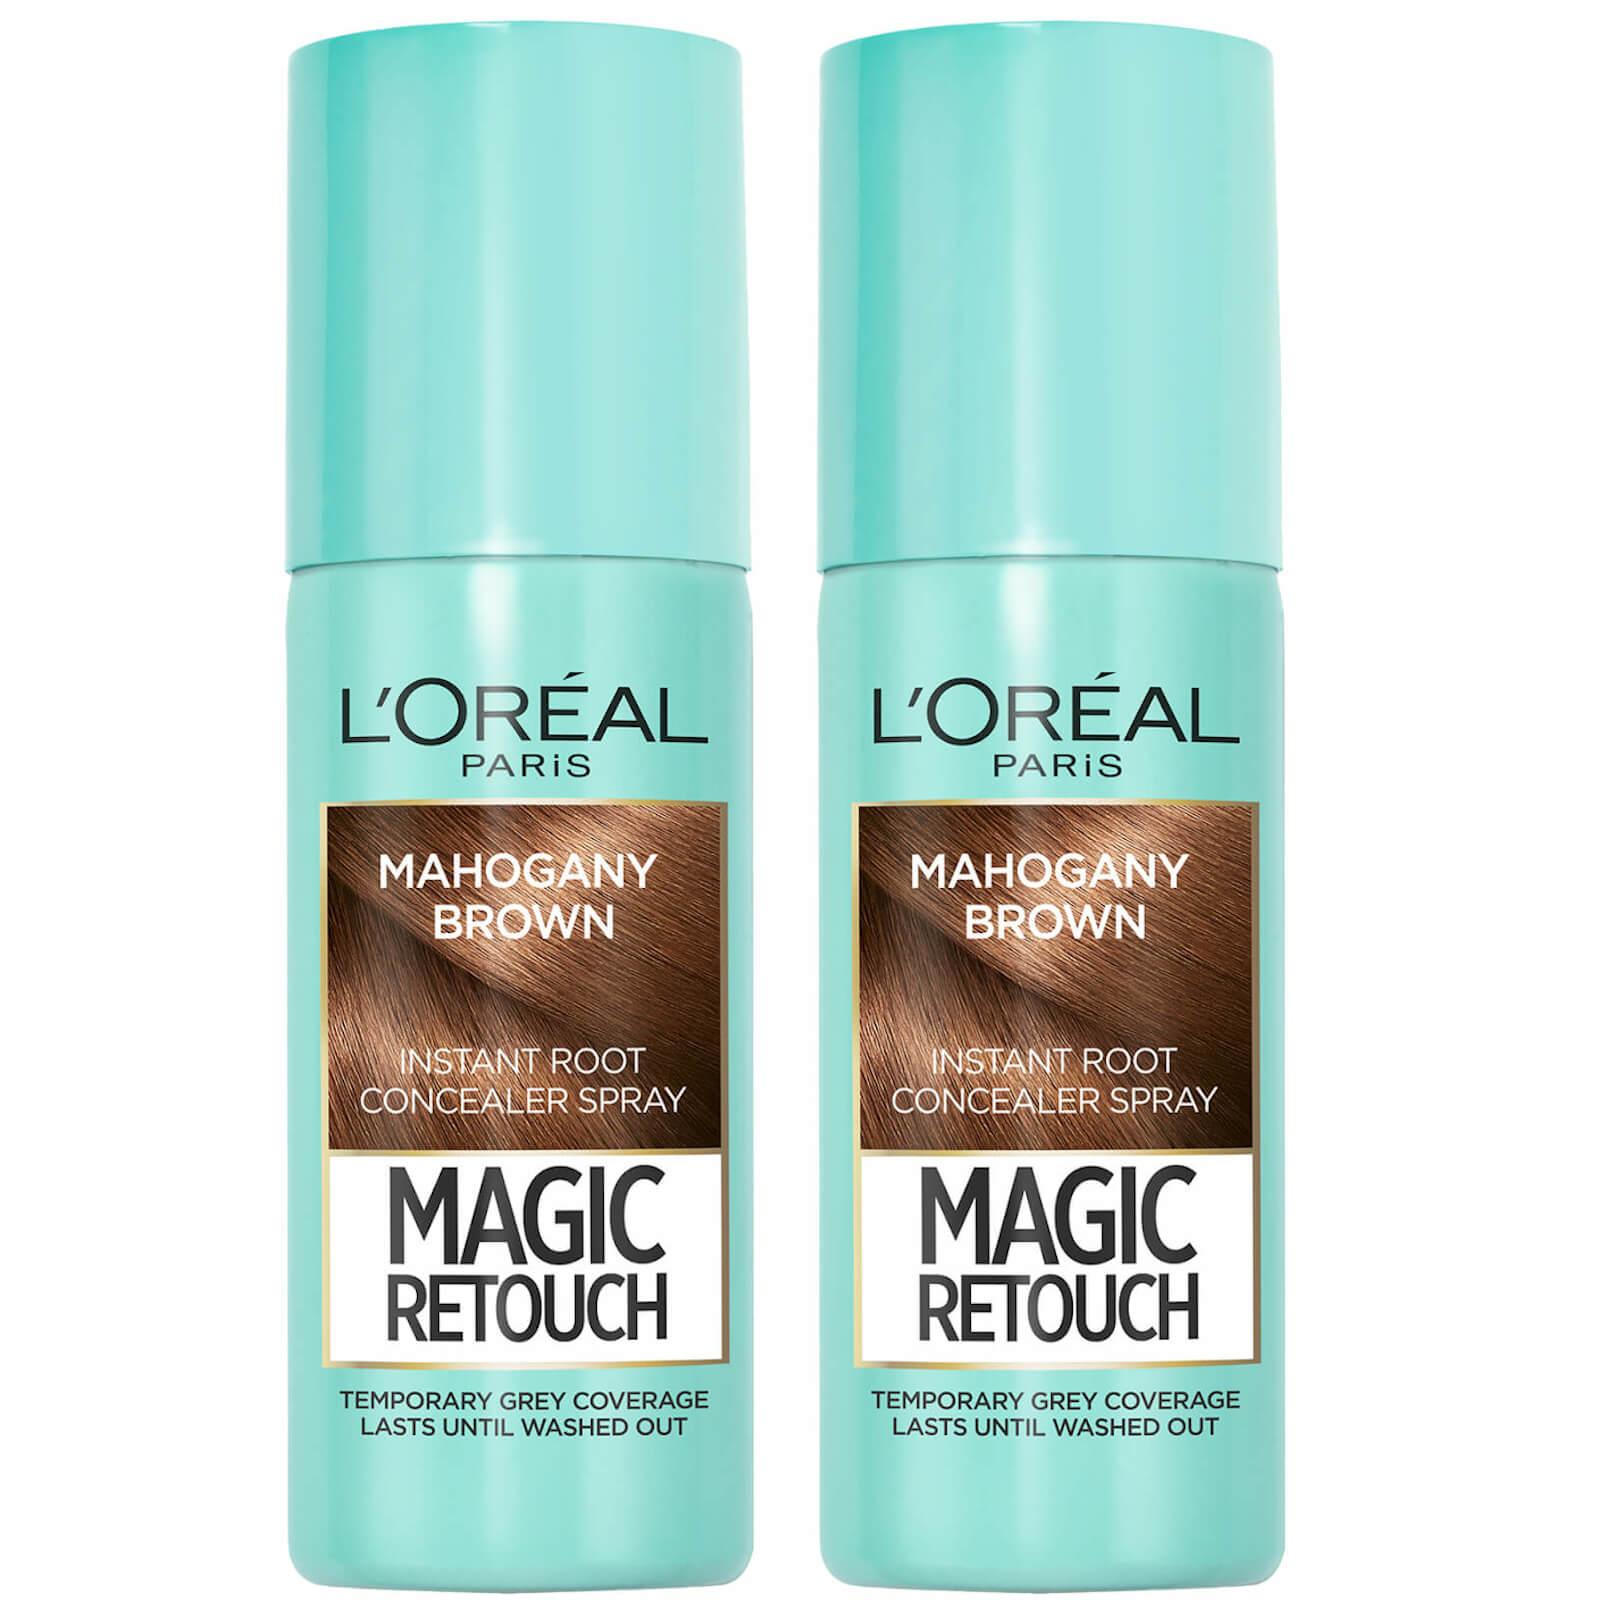 L'Oréal Paris Magic Retouch Mahogany Brown Root Concealer Spray Duo Pack